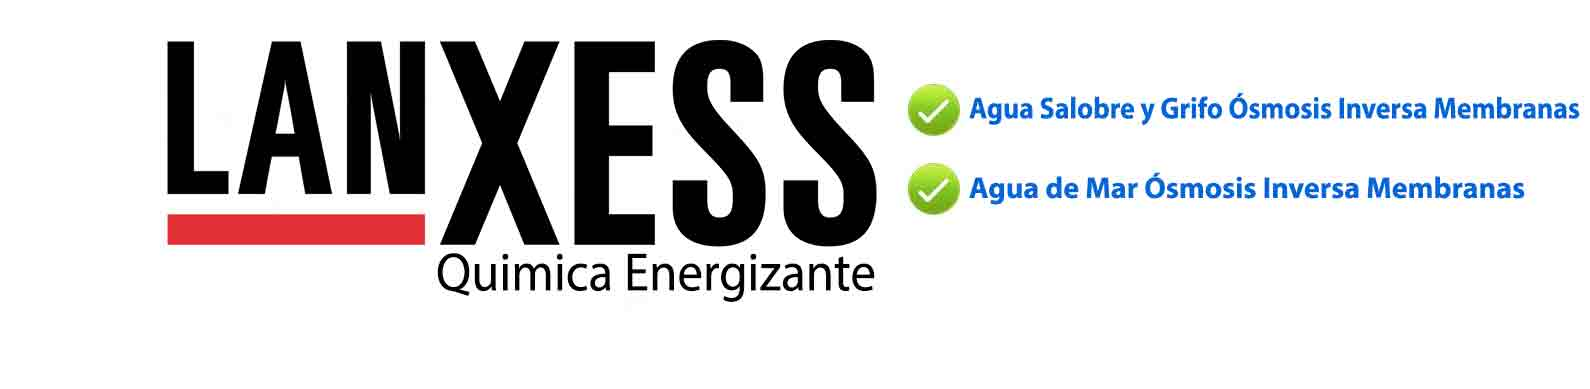 lanxess-quimica-energizante.jpg